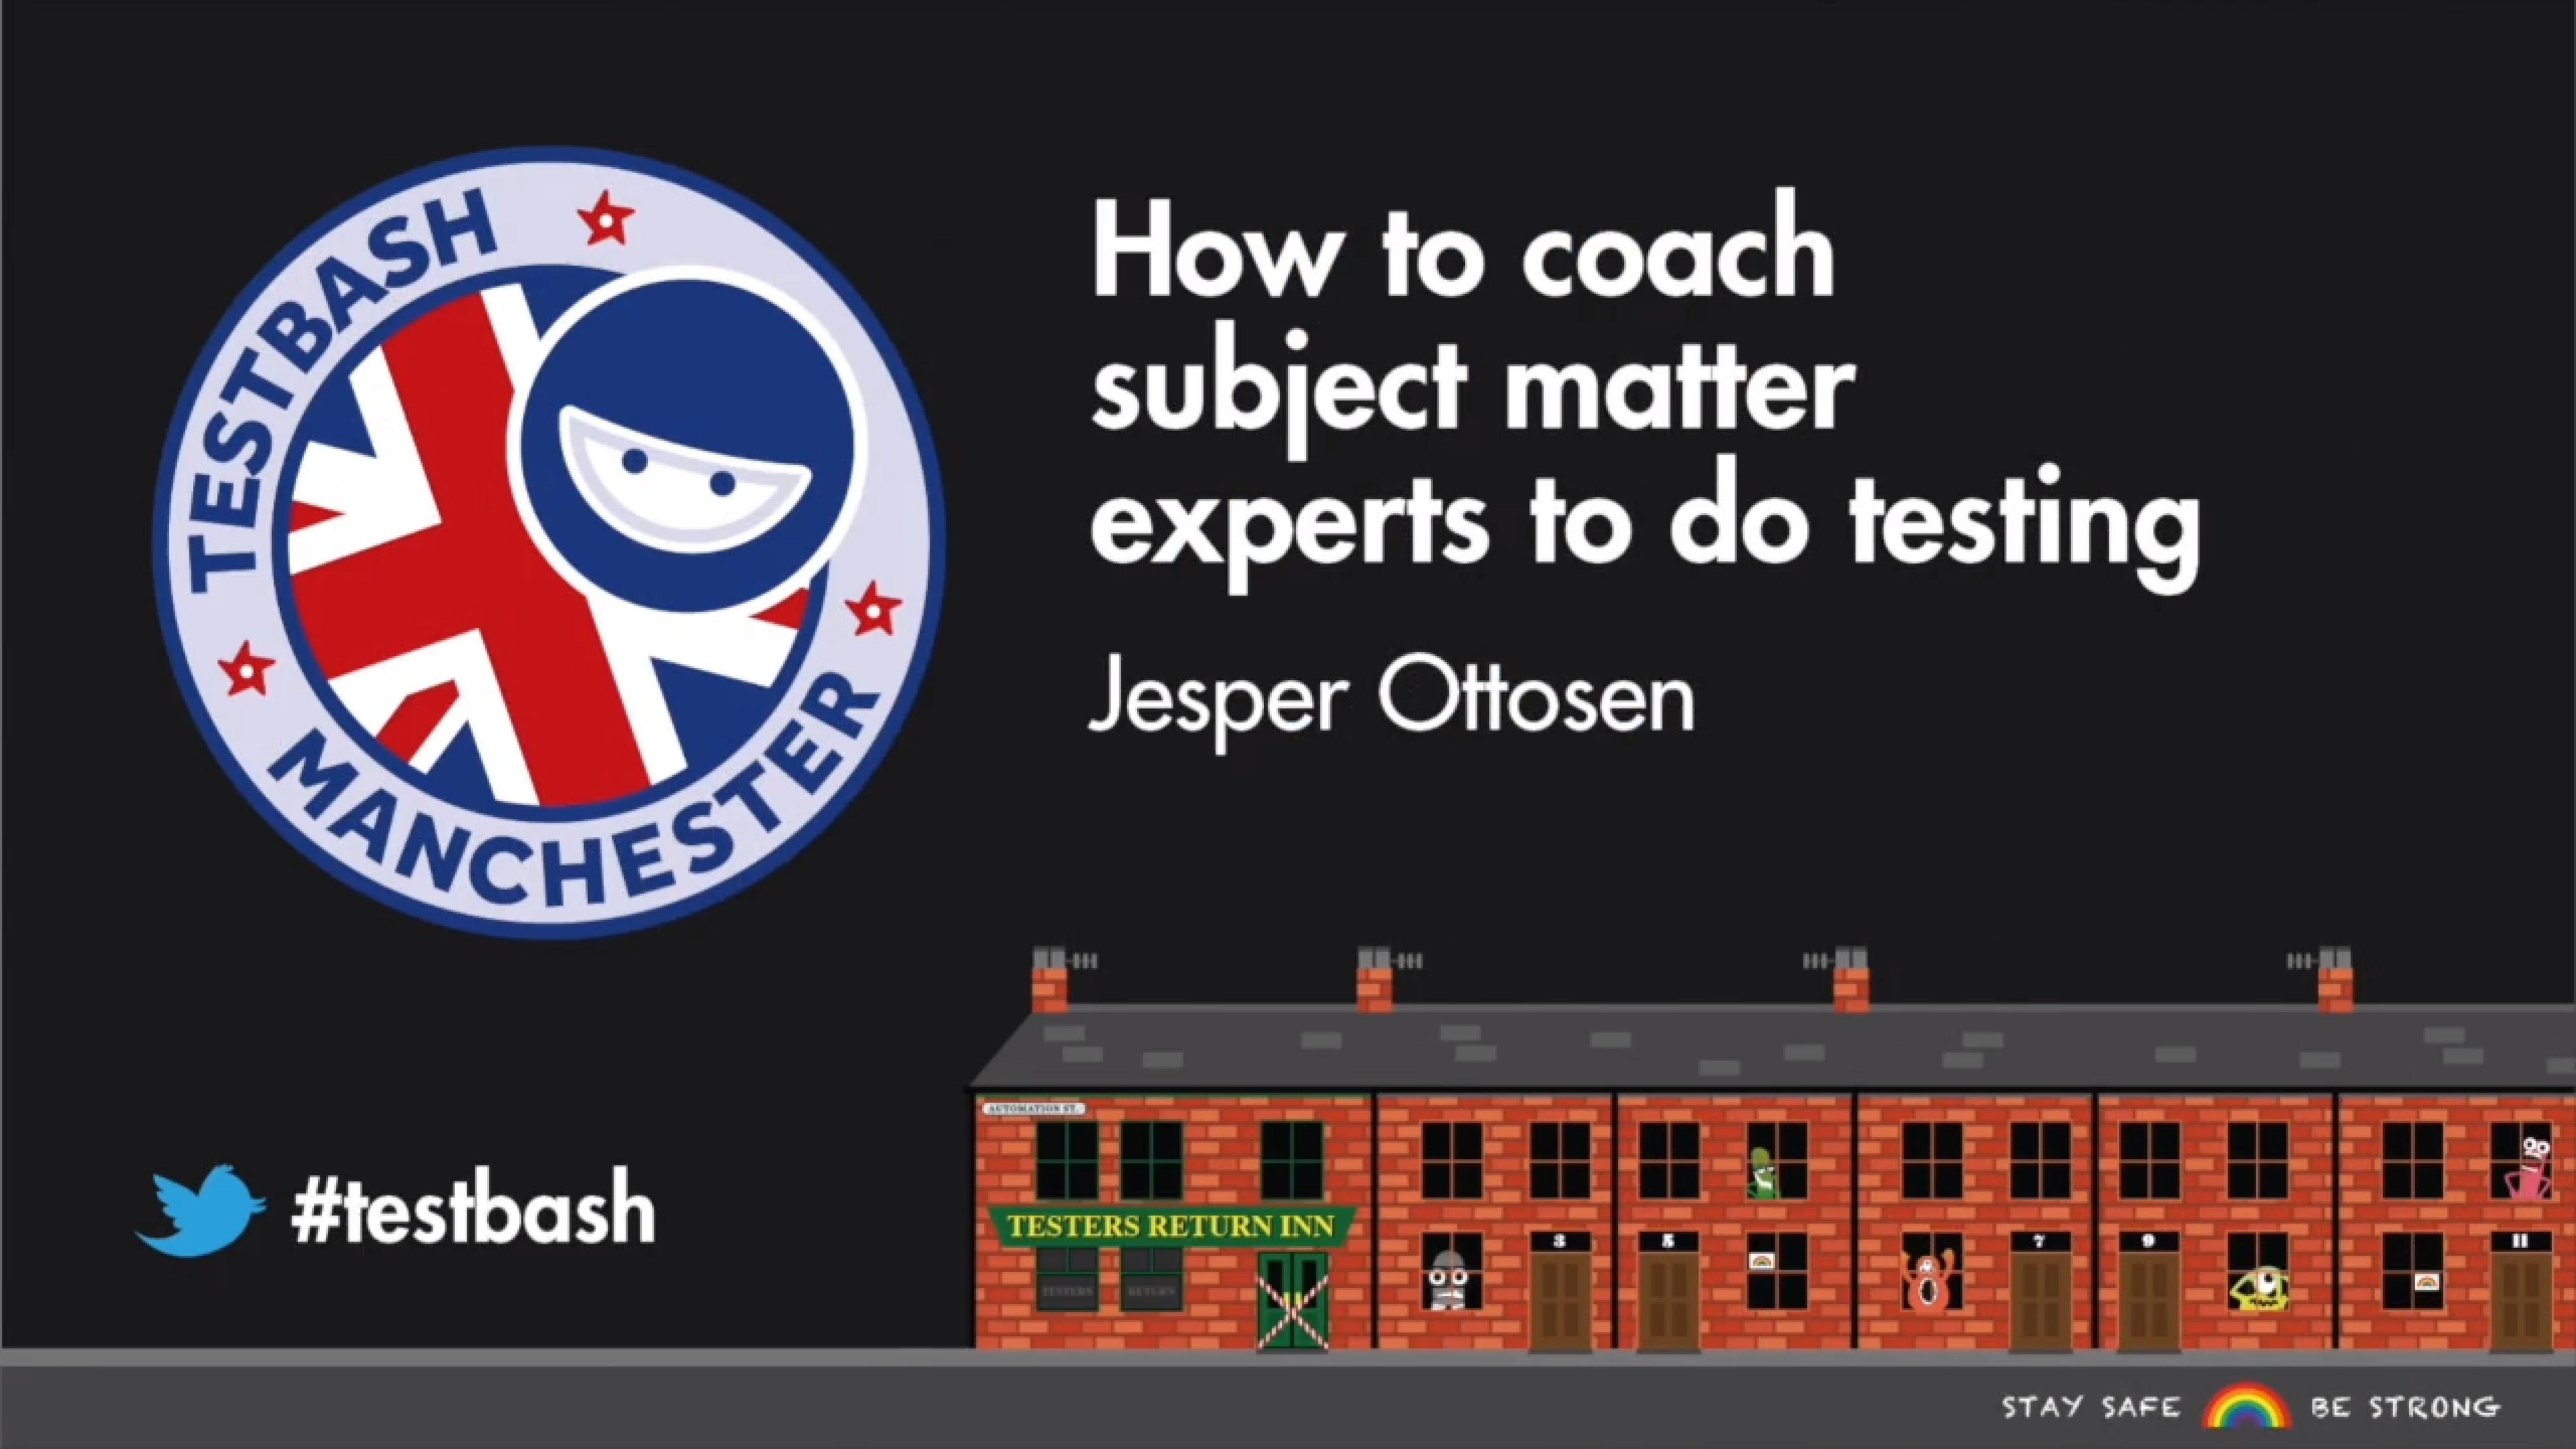 How to Coach Subject Matter Experts to Do Testing - Jesper Ottosen